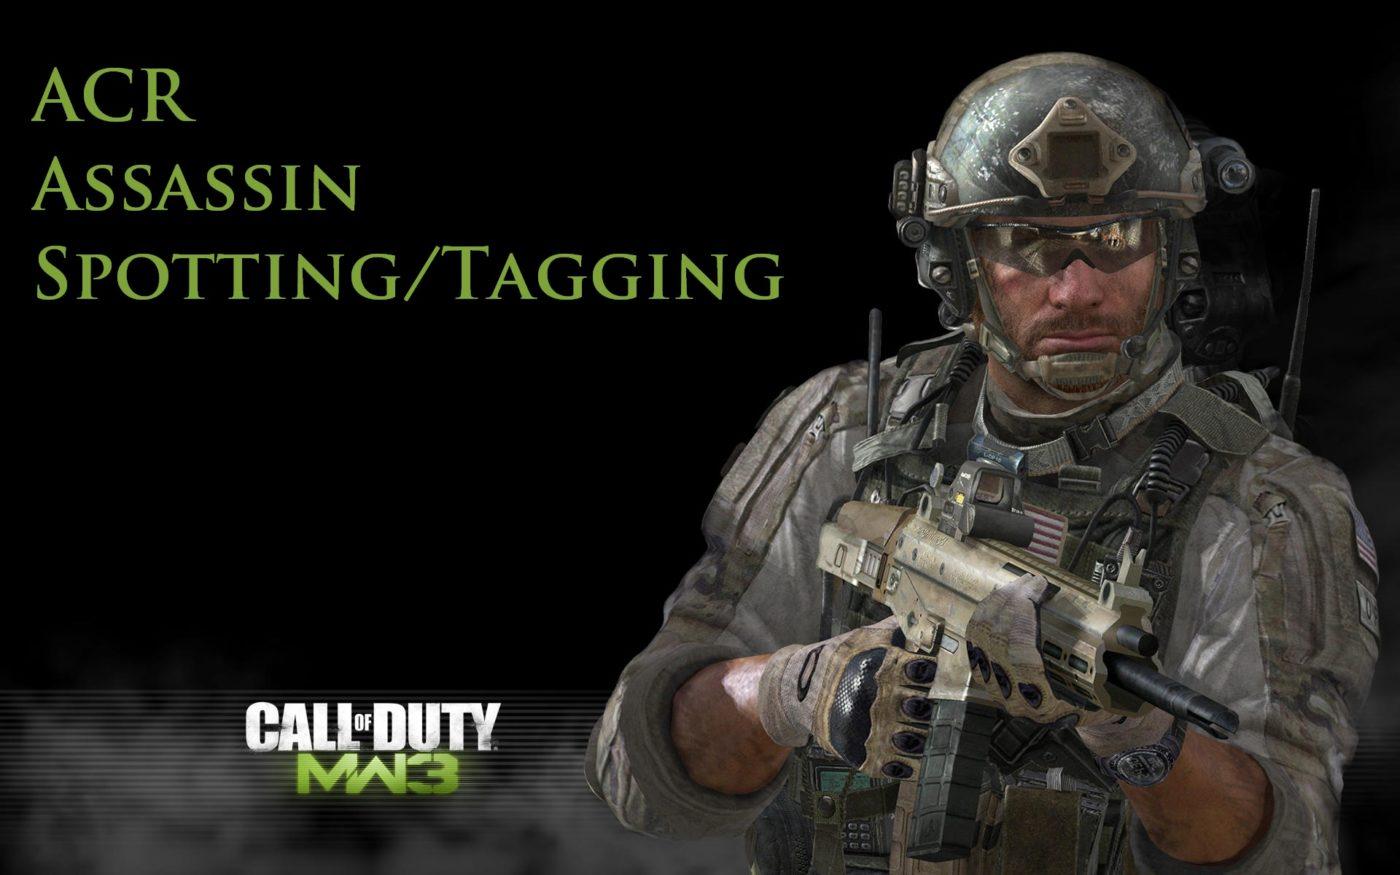 Call of Duty: Modern Warfare 3 to Be a Prequel - Report